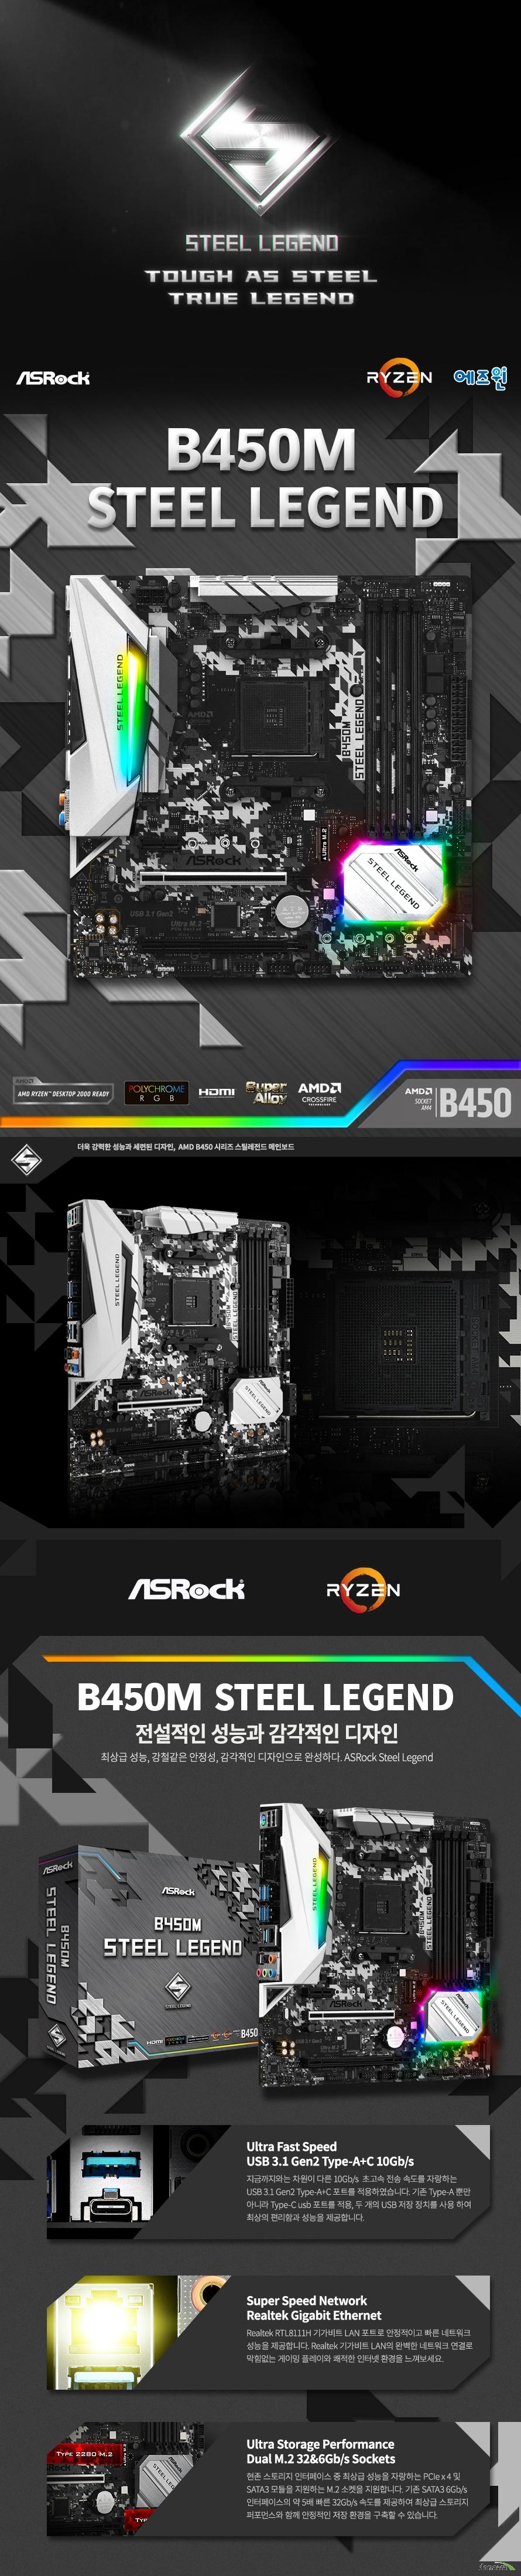 ASRock B450M 스틸레전드 에즈윈  제품 상세 스펙  AMD am4 소켓 라이젠 서밋 릿지, 피나클릿지 및 레이븐 릿지 CPU 지원  6파워 페이즈 디자인 수냉 쿨링 피나클릿지 최대 105와트, 서밋릿지 최대 95와트 및 레이븐 릿지 최대 65와트 지원  Amd b450칩셋 적용  듀얼채널 ddr4 메모리 최대 64기가바이트 지원  Amd 라이젠 피나클릿지 cpu  Ddr4 3533+ 3200 2933 2667 2400 2133 ecc 및 non ecc un buffered memory 지원  Amd 라이젠 서밋릿지 cpu  Ddr4 3466+ 3200 2933 2667 2400 2133 ecc 및 non ecc un buffered memory 지원  Amd 라이젠 레이븐릿지 cpu  Ddr4 3200+ 2933 2667 2400 2133 ecc 및 non ecc un buffered memory 지원 레이븐 릿지 pro 시리즈 cpu에서만 ecc메모리를 지원합니다.  32비트 운영체제환경에서는 실제 메모리 사이즈가 4기가바이트 이하로 인식될 수 있습니다.  확장 슬롯  Amd 라이젠 서밋릿지 및 피나클릿지 cpu Pcie 3.0 16배속 슬롯 1개 지원  Pcie2 슬롯에서 싱글 사용시 16배속 동작 Pcie 2.0 16배속 슬롯 1개 지원  Pcie3 슬롯에서 싱글 사용시 4배속 동작  Amd 라이젠 레이븐 릿지 cpu Pcie 3.0 16배속 슬롯 1개 지원 Pcie2 슬롯에서 싱글 사용시 8배속 동작 Pcie 2.0 16배속 슬롯 1개 지원  Pcie3 슬롯에서 싱글 사용시 4배속 동작  Pcie 2.0 1배속 슬롯 1개 지원  Amd 쿼드 크로스파이어 및 크로스 파이어 지원  Sata3 소켓 4개 지원 (raid 0 1 10 및 ncq AHCI및 HOT PLUG) 울트라 M.2 소켓 1개 지원 2242 2260 2280 규격 및 PCIE GEN3 4배속 최대 32기가바이트 지원 NVME SSD as boot disk 및 애즈락 u.2 kit 지원  m.2 소켓 1개 지원 2230 2242 2260 2280 규격 및 SATA3 최대 6기가바이트 지원 M2_2 소켓과 sata3_3 포트는 대역폭을 공유하여 둘 중 하나를 사용하면 다른 하나는 비활성화 됩니다.  Usb 3,1 gen2 a+c 포트 지원 (후면 2개) Usb 3.1 gen1 포트 6개 지원 (후면 4개 전면 2개) Usb 2.0 포트 6개 지원 (후면 2개 전면 4개)  리얼텍 RTL8111H 기가비트 랜 지원  리얼텍 alc892 7.1채널 hd 오디오 코덱 지원  마이크로소프트 윈도우 10 64비트 운영체제 지원 마이크로 ATX 폼팩터 크기 길이 24.4센티미터 넓이 24.4센티미터 KC 인증번호 R R ASR B450MSTEELLEG  제조사의 사정에 따라 사전고지 없이 일부 제품사양이 변경될 수 있으며 부품 호환 등 더 자세한 정보는 제조사 홈페이지 또는 제품 매뉴얼을 참고해주시기 바랍니다.